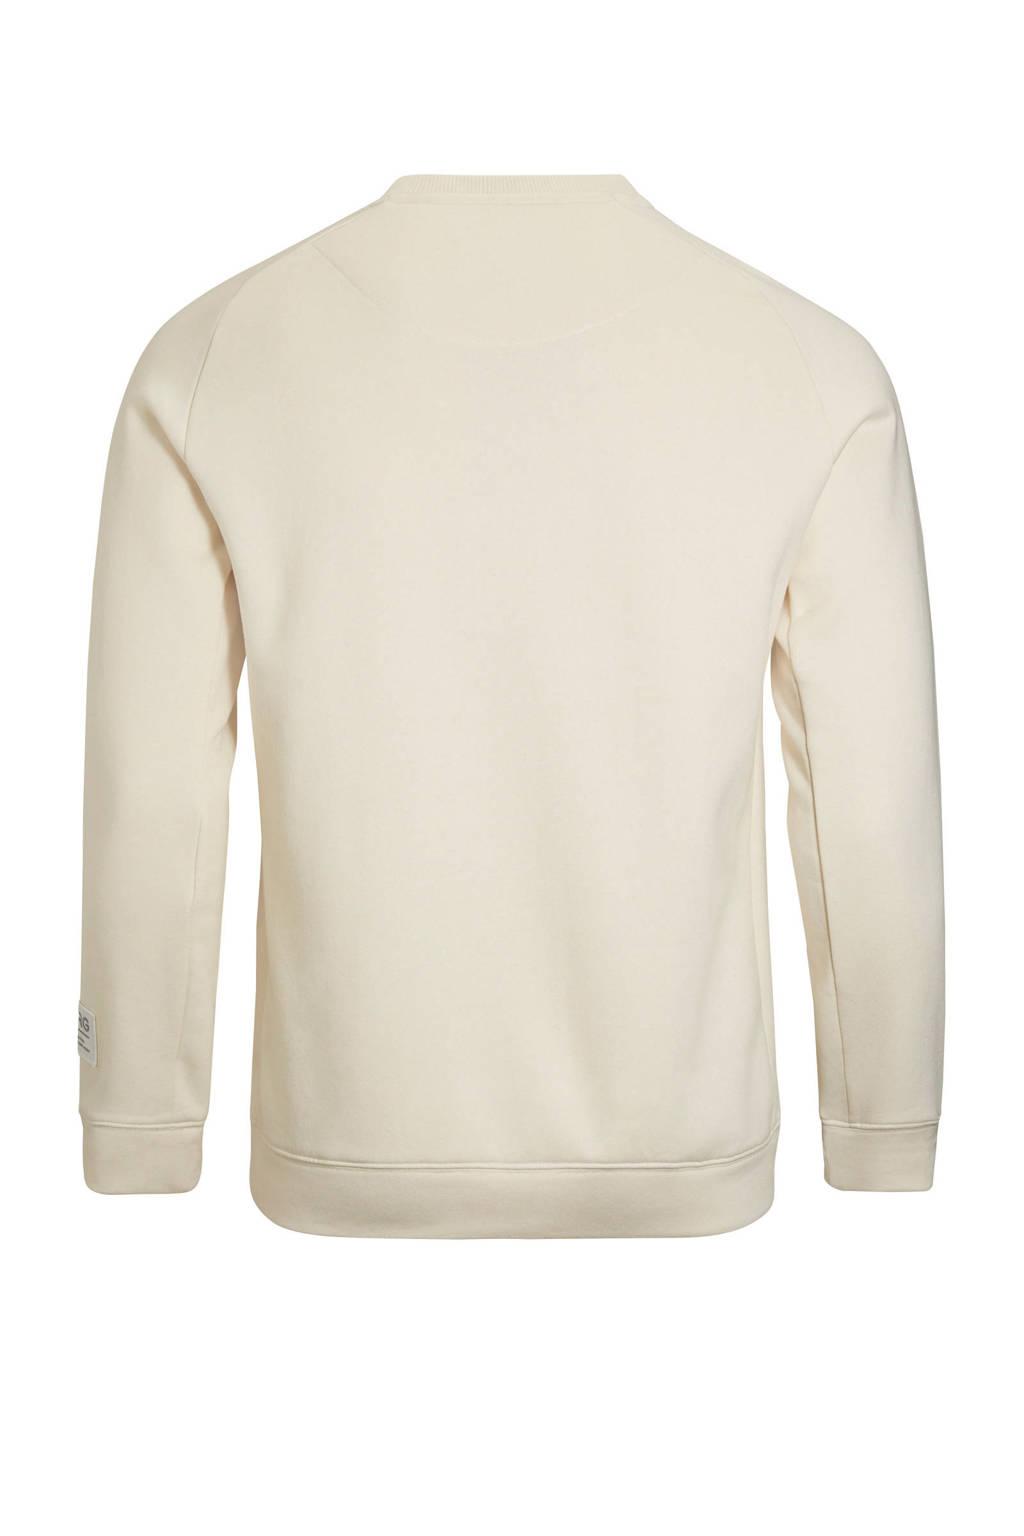 Björn Borg   sportsweater wit, Wit